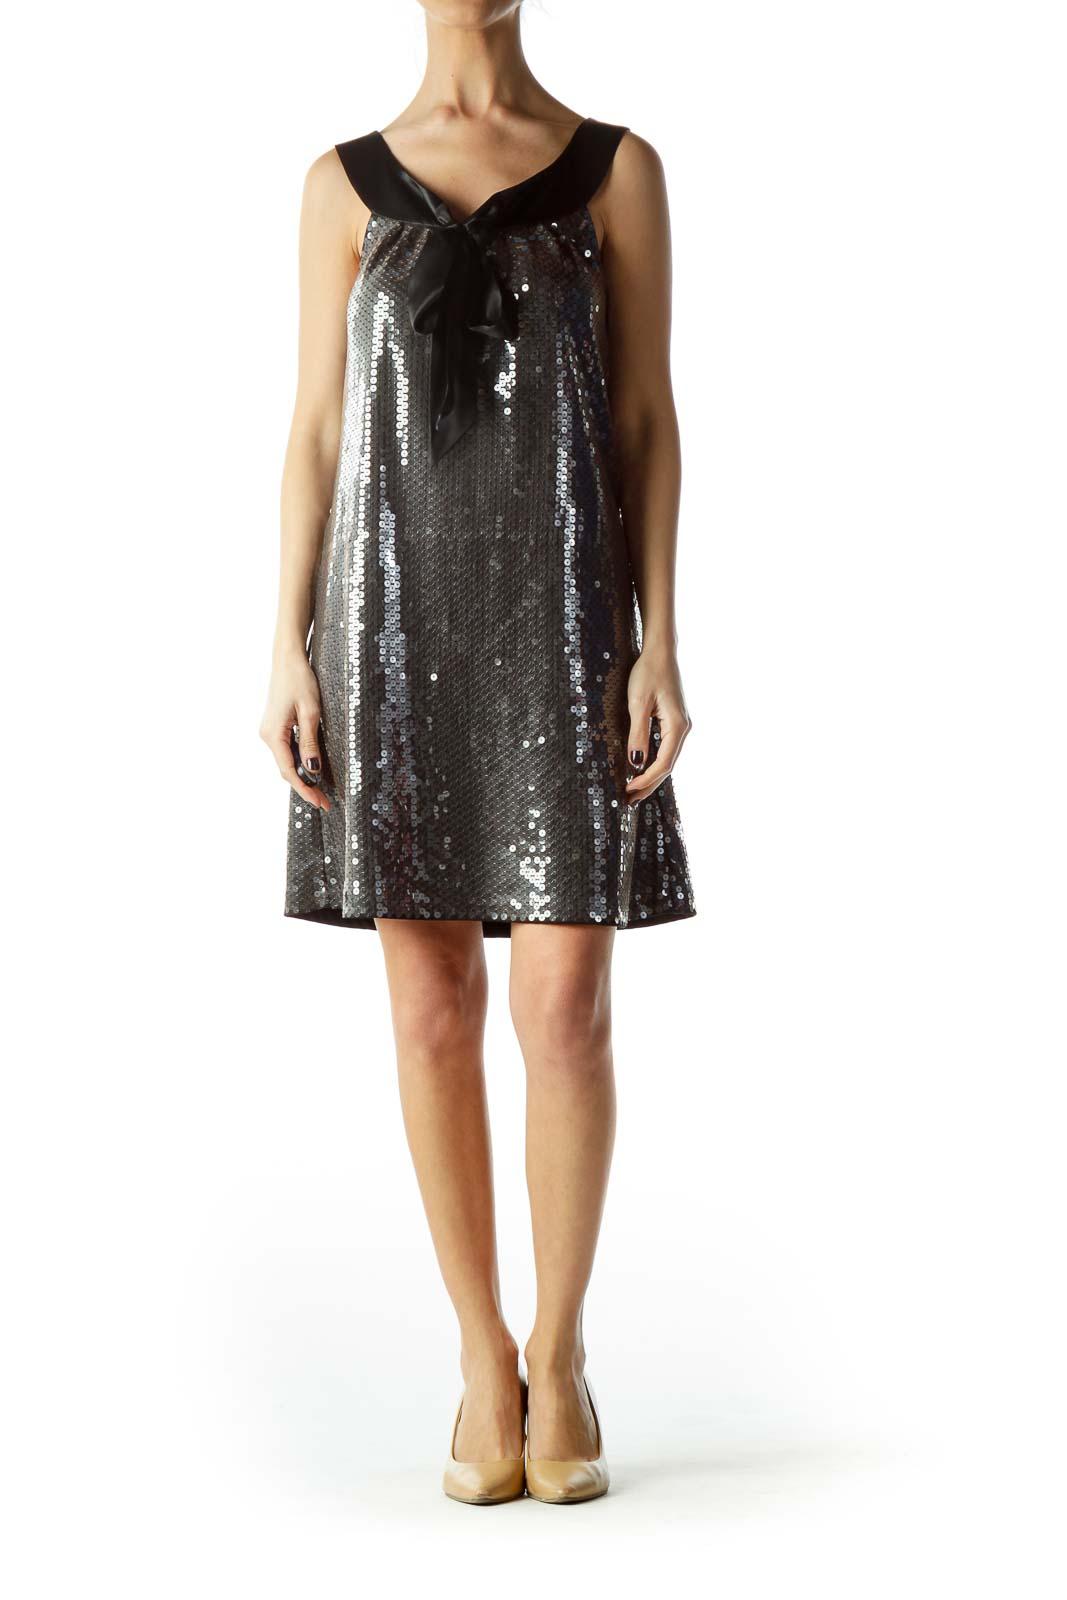 Silver Black Ribbon Neckline Cocktail Dress